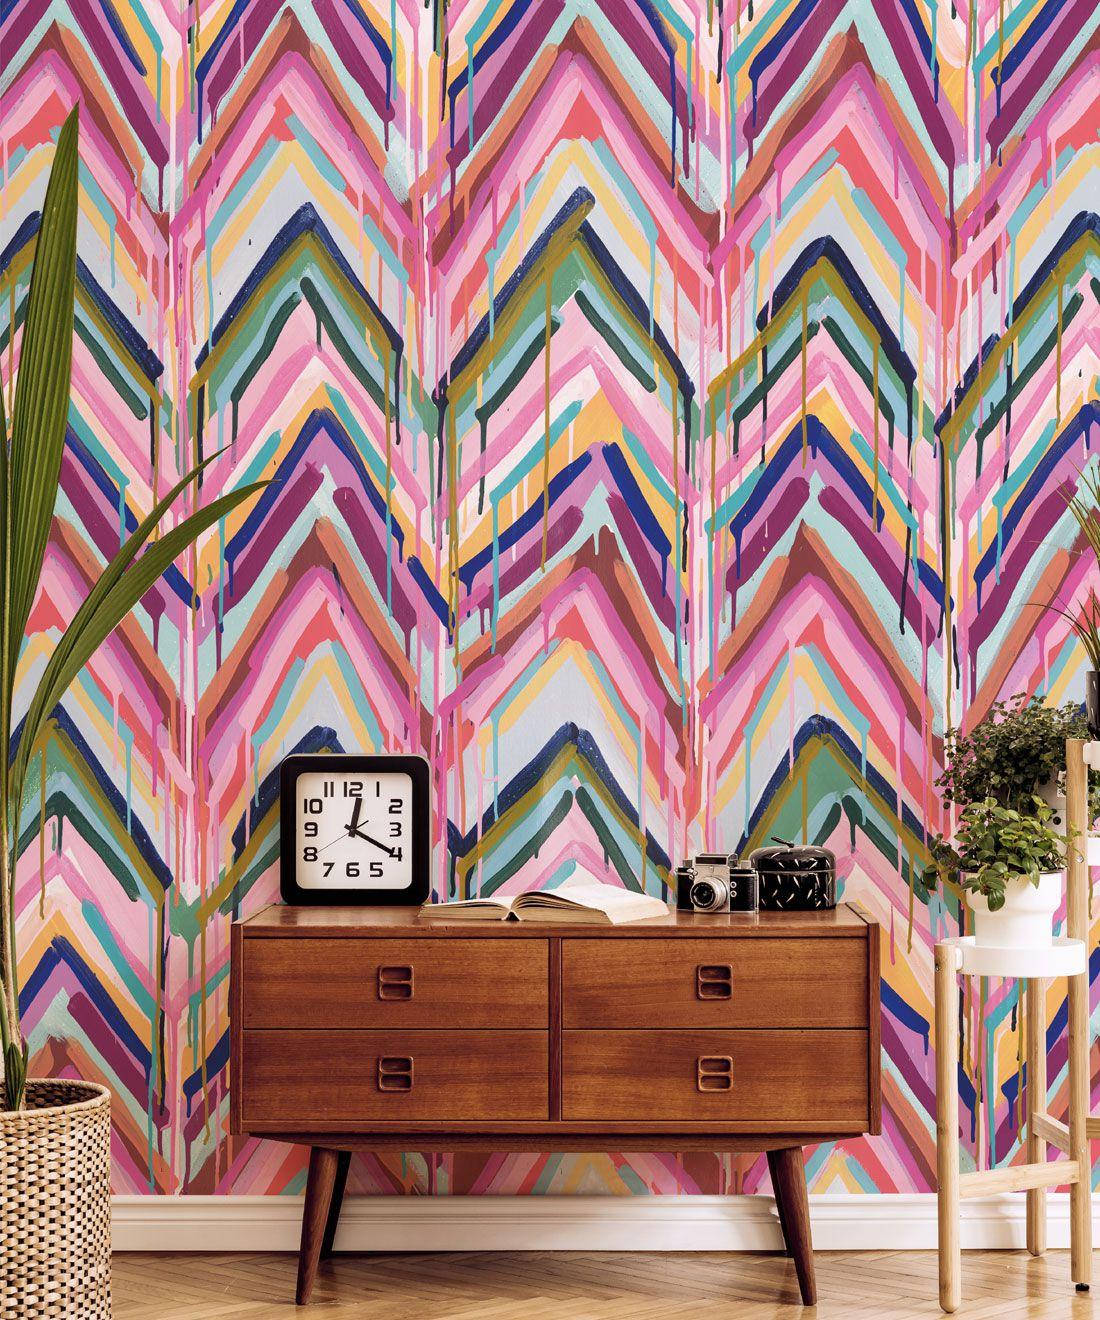 Crossroads Wallpaper •Colourful Painterly Wallpaper • Tiff Manuell • Chevron Wallpaper • Closeup Insitu